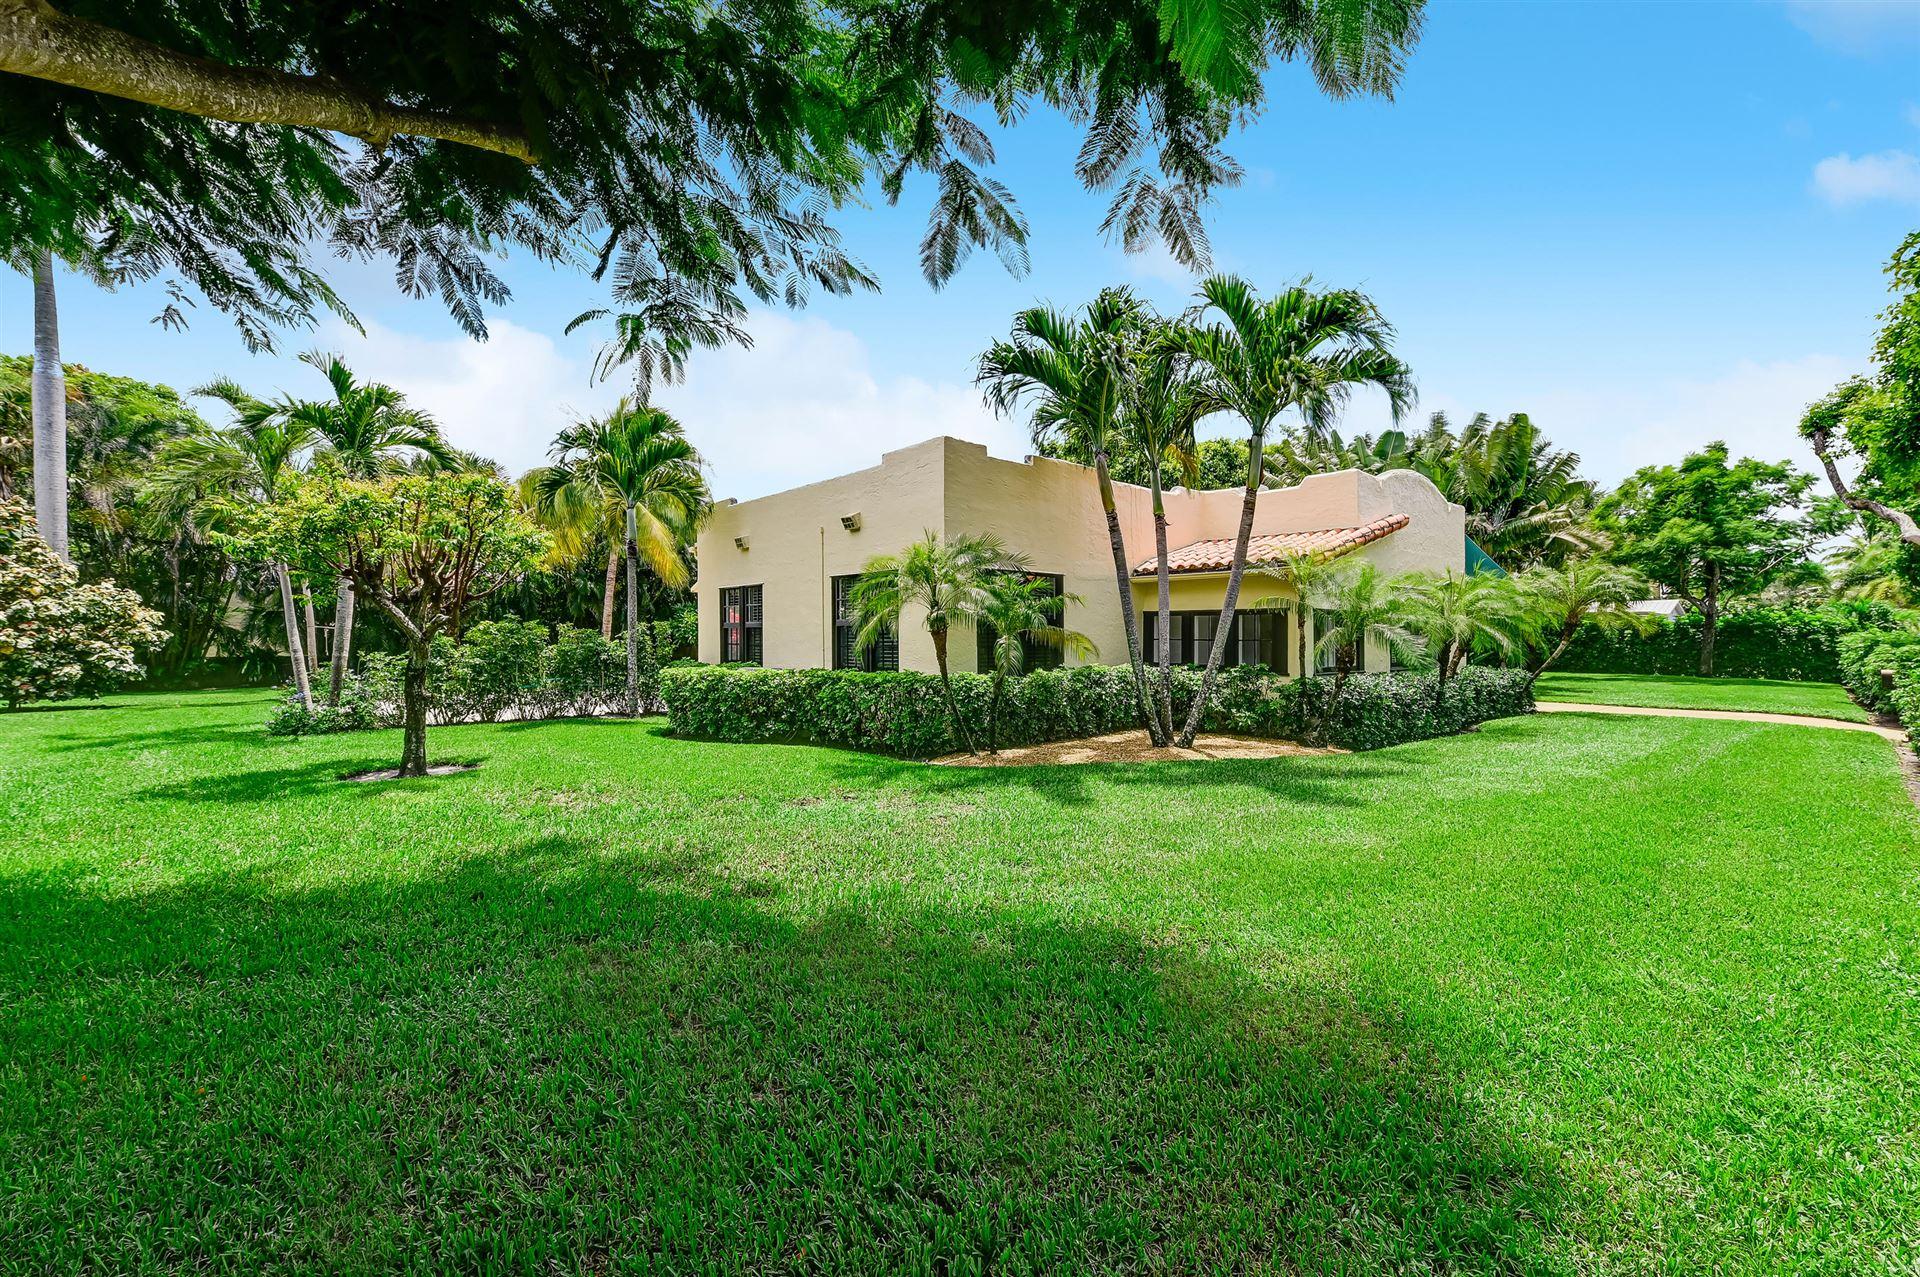 Photo of 316 Pilgrim Road, West Palm Beach, FL 33405 (MLS # RX-10733388)